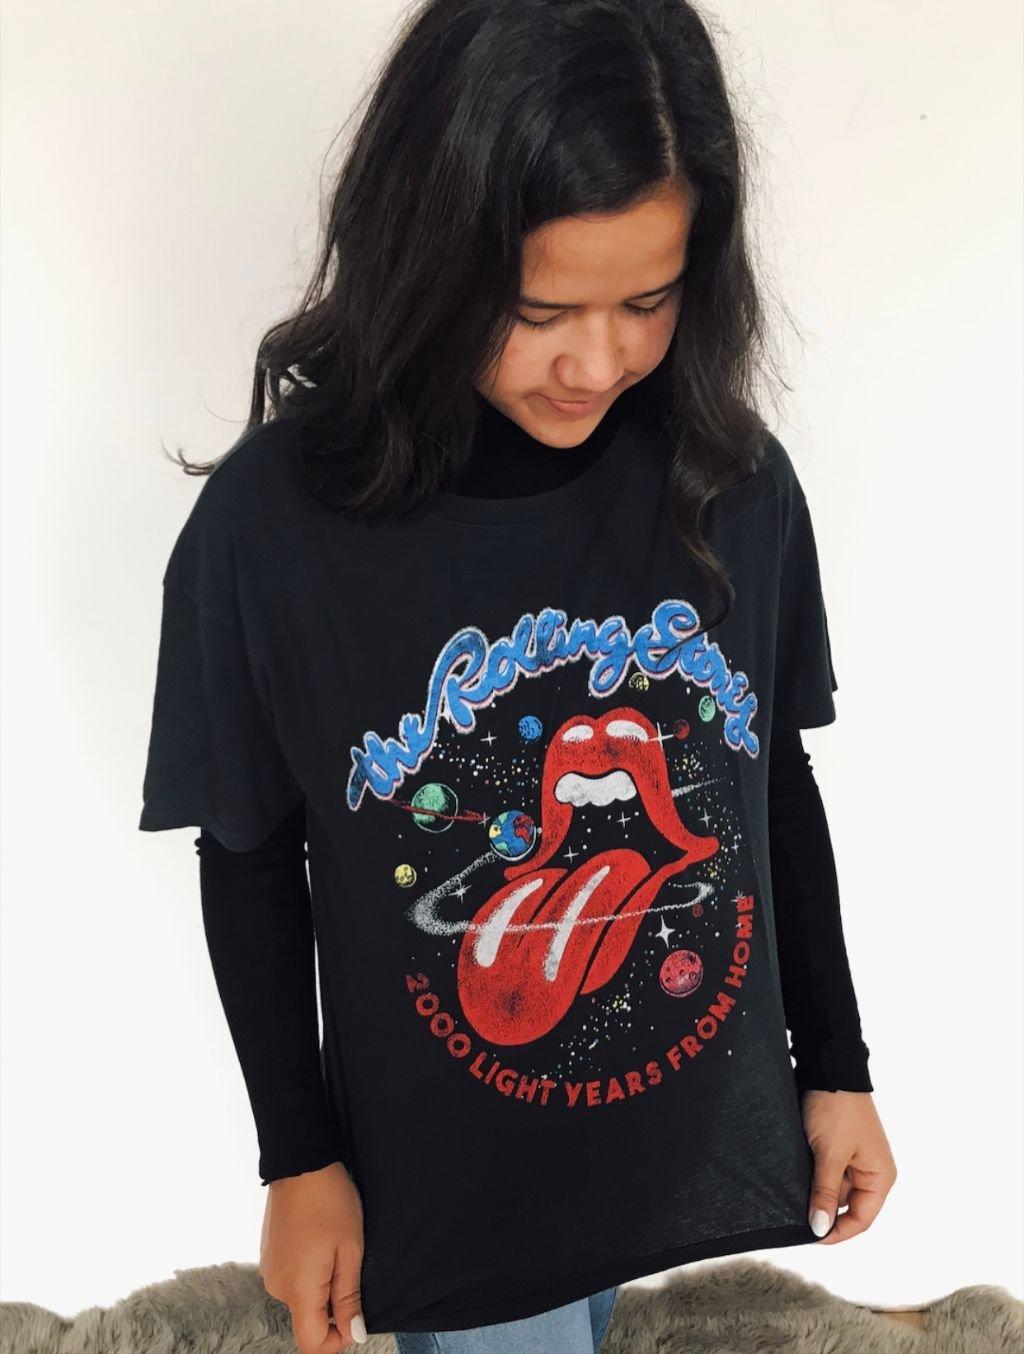 Daydreamer Rolling Stones Tee